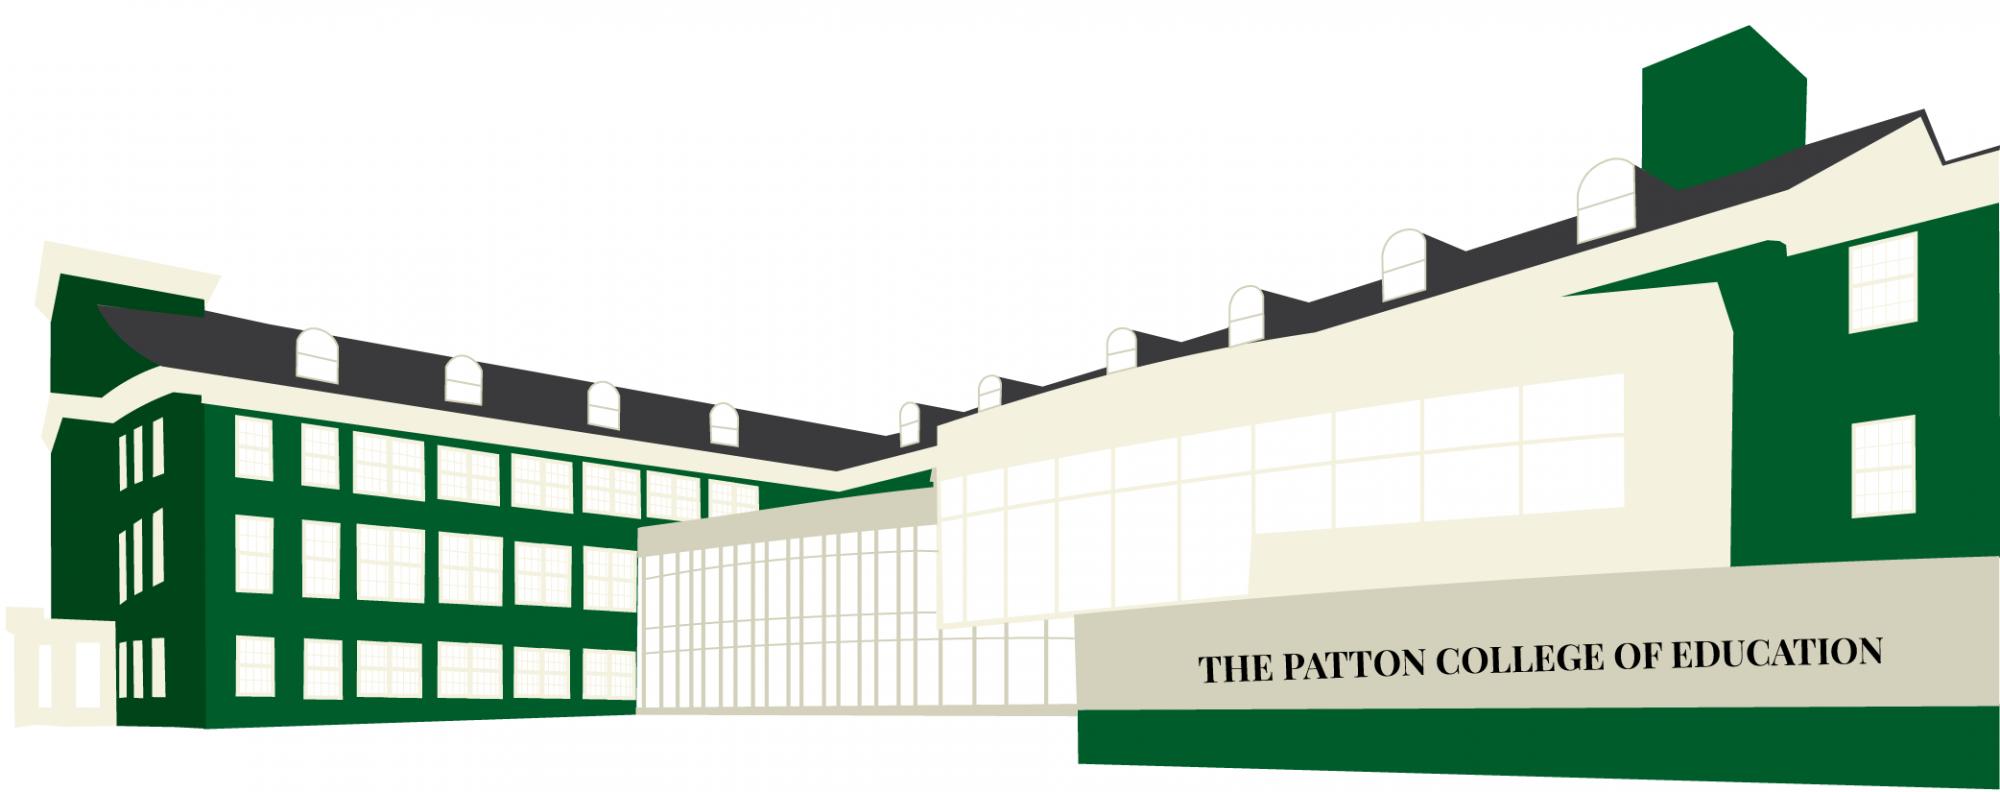 Illustration of Patton College